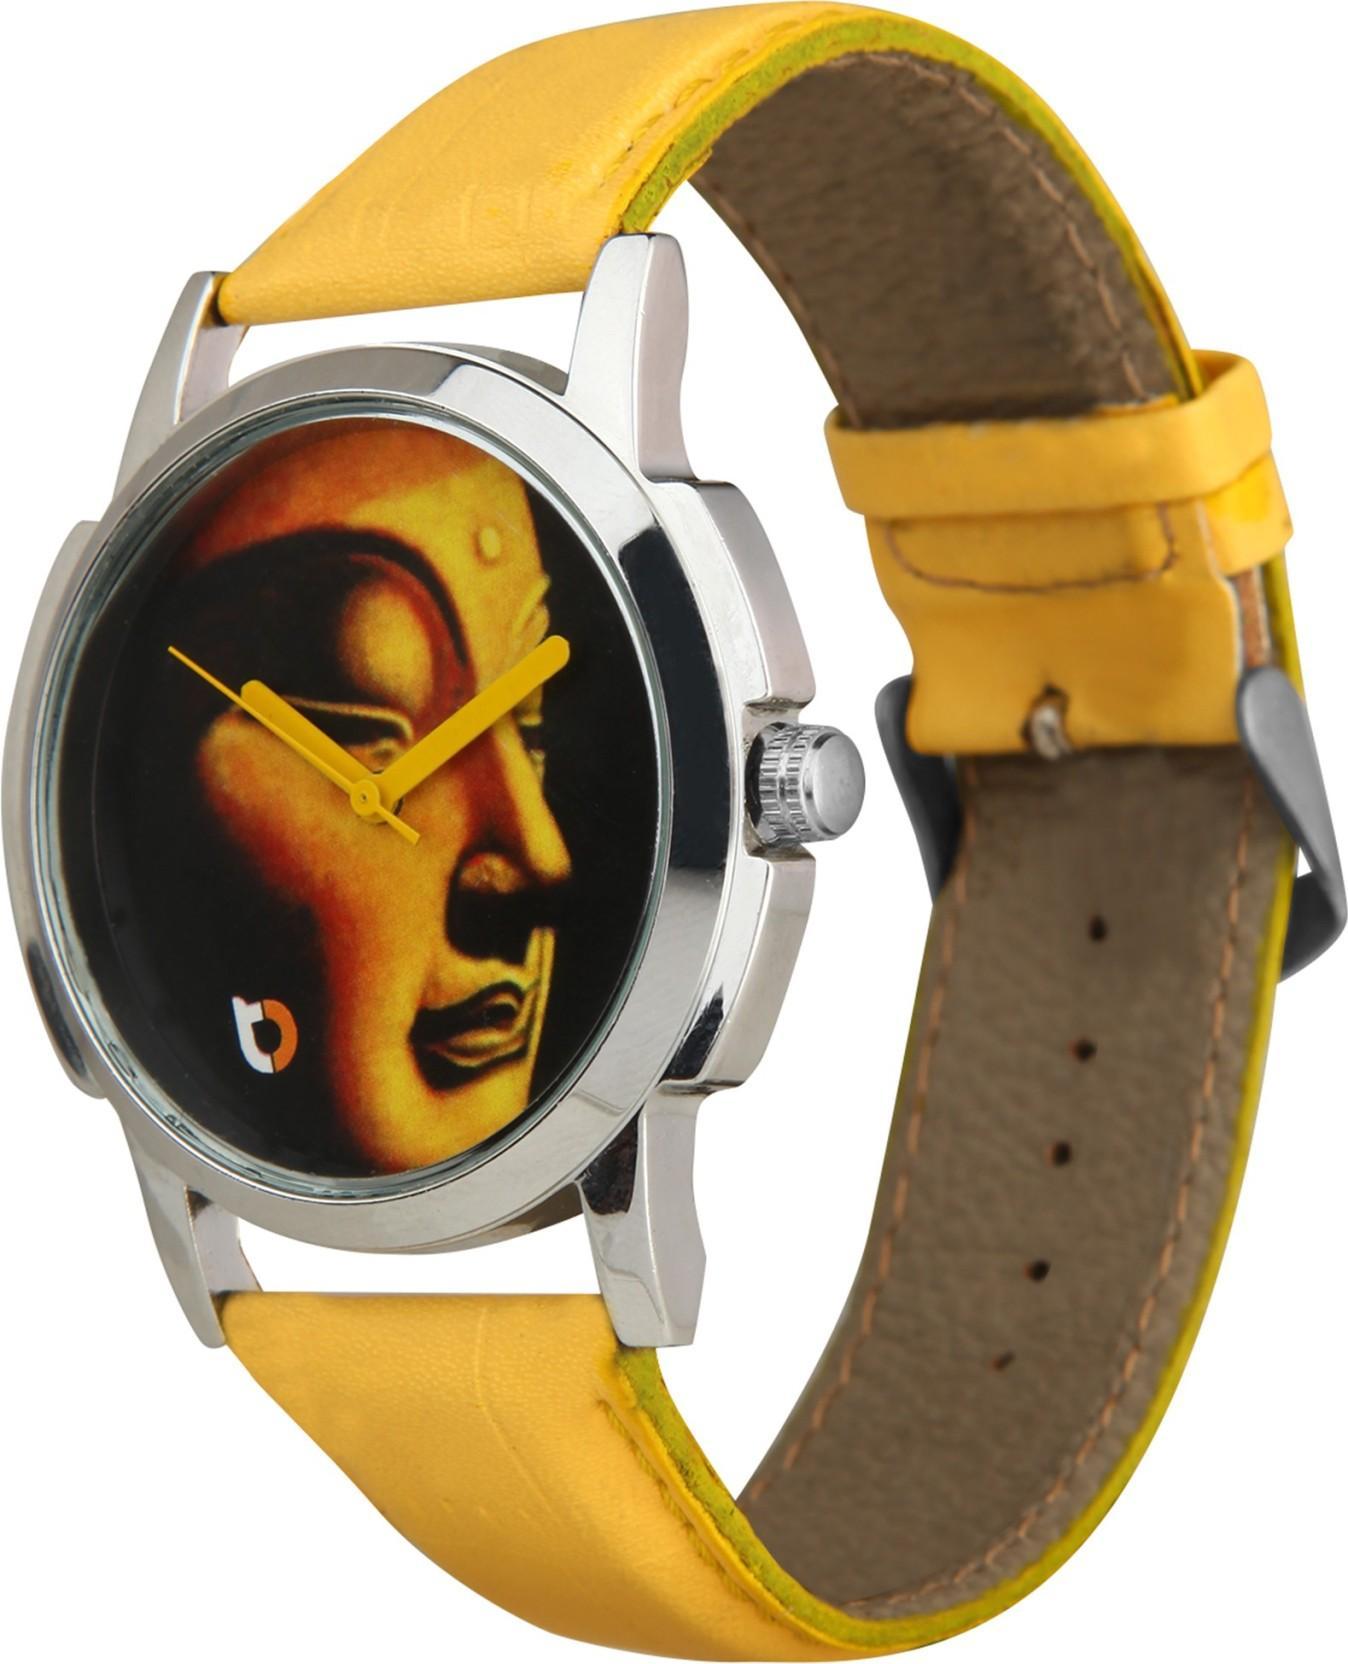 Timebre VBLK572-2 Milano Watch - For Men